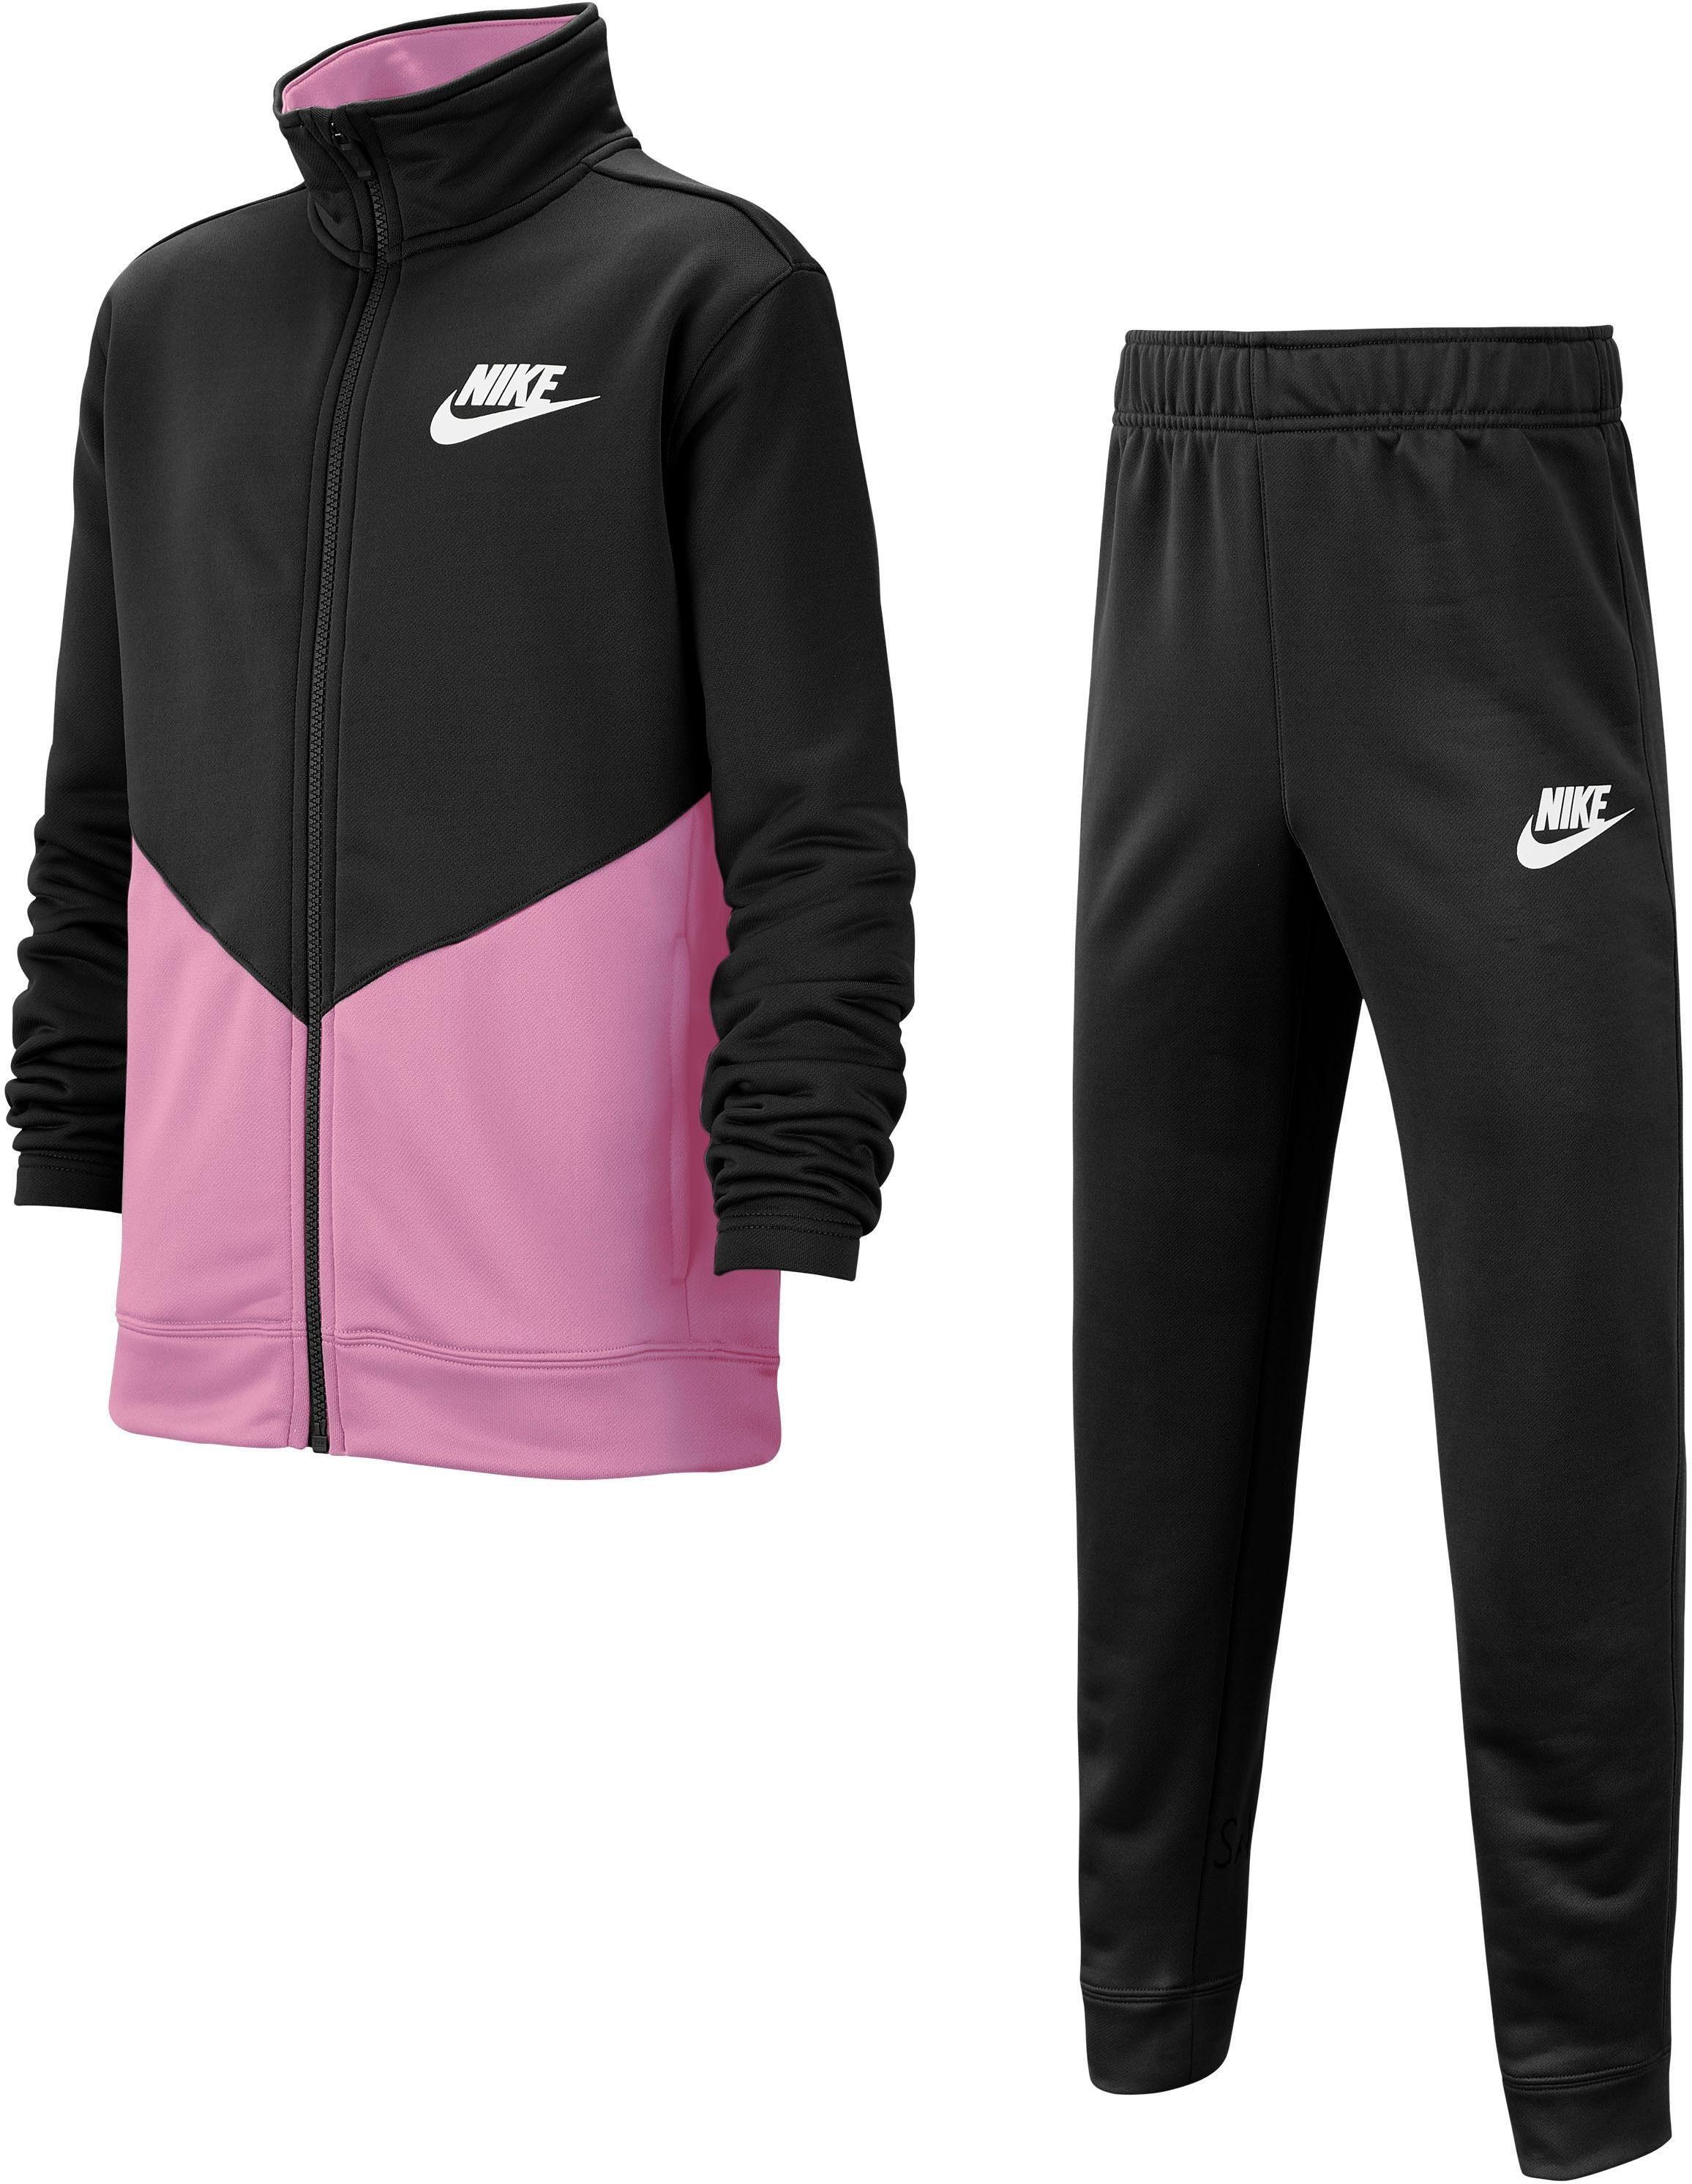 Nike Sportswear Trainingsanzug »NIKE SPORTSWEAR CORE TRACKSUIT PLAY FUTURA« online kaufen | OTTO